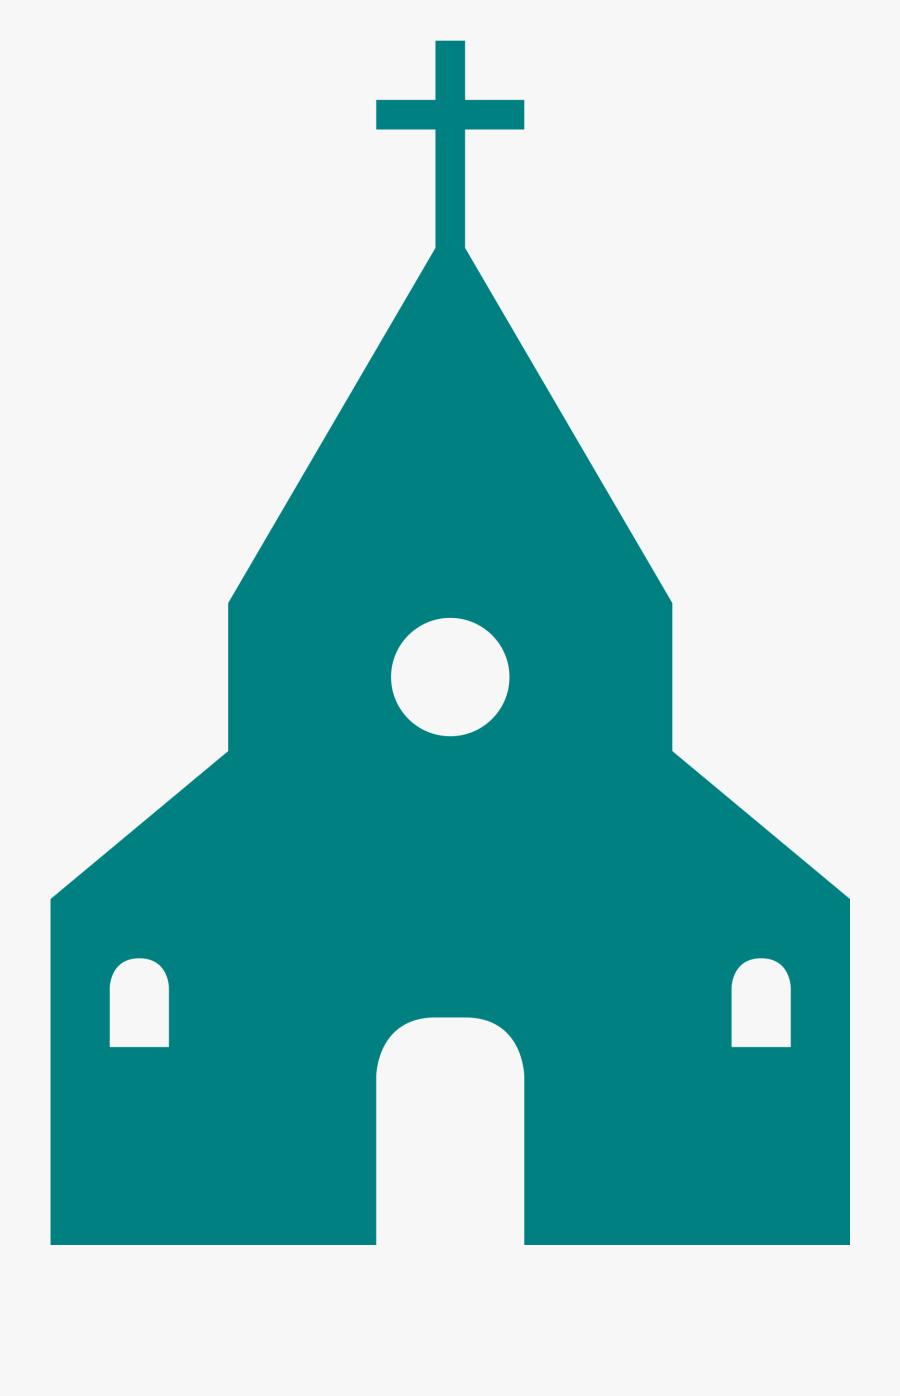 Big Image Png - Church Service Clip Art Png, Transparent Clipart